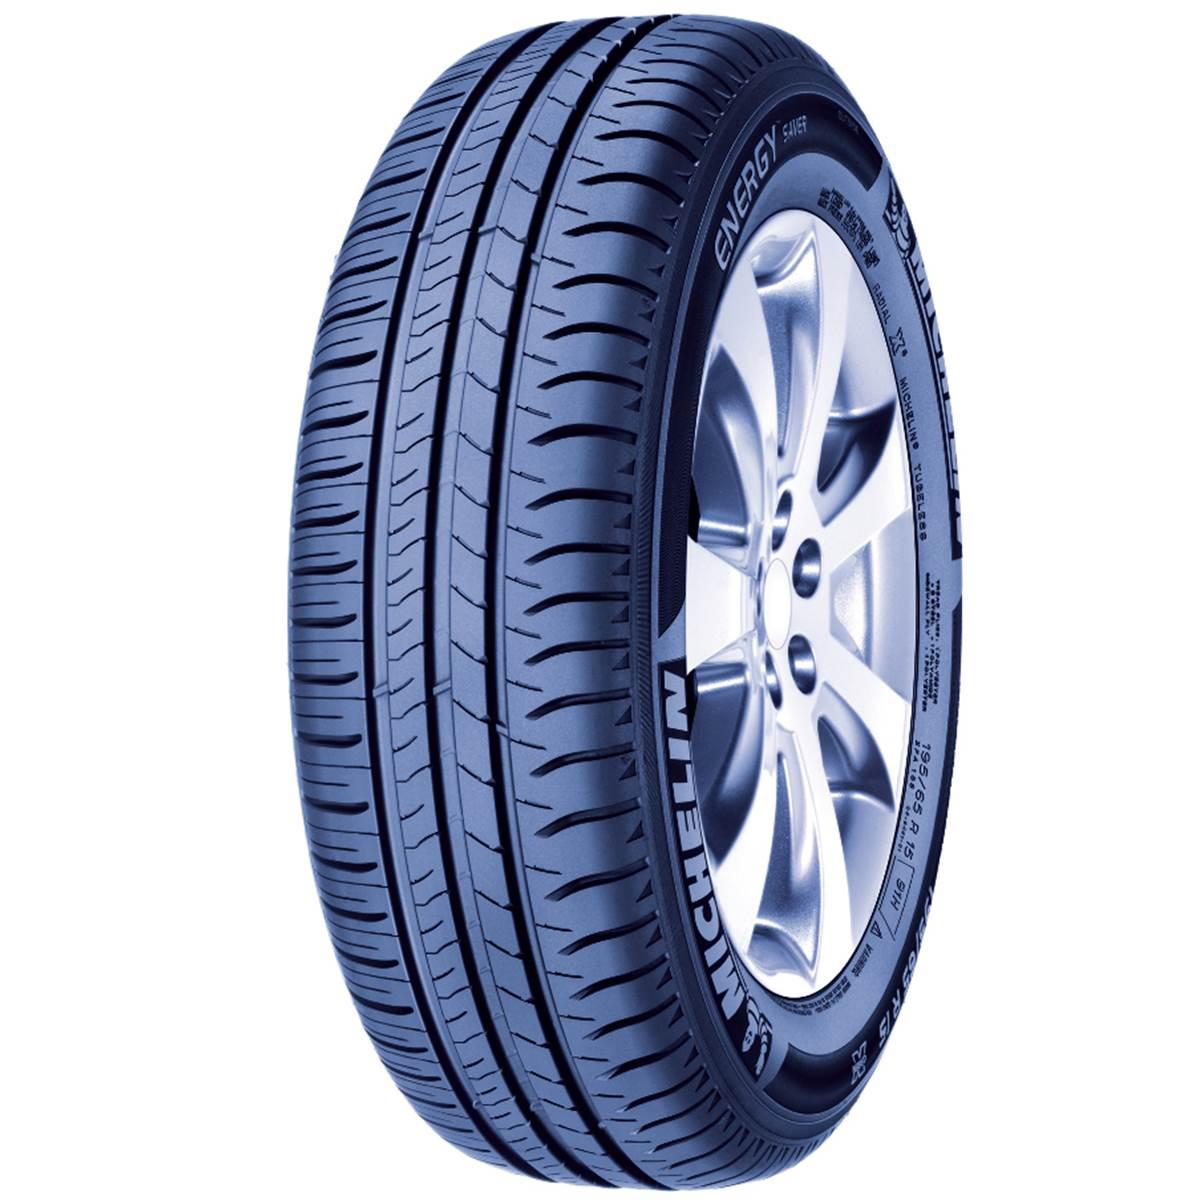 Pneu Michelin 215/55R17 94H Energy Saver